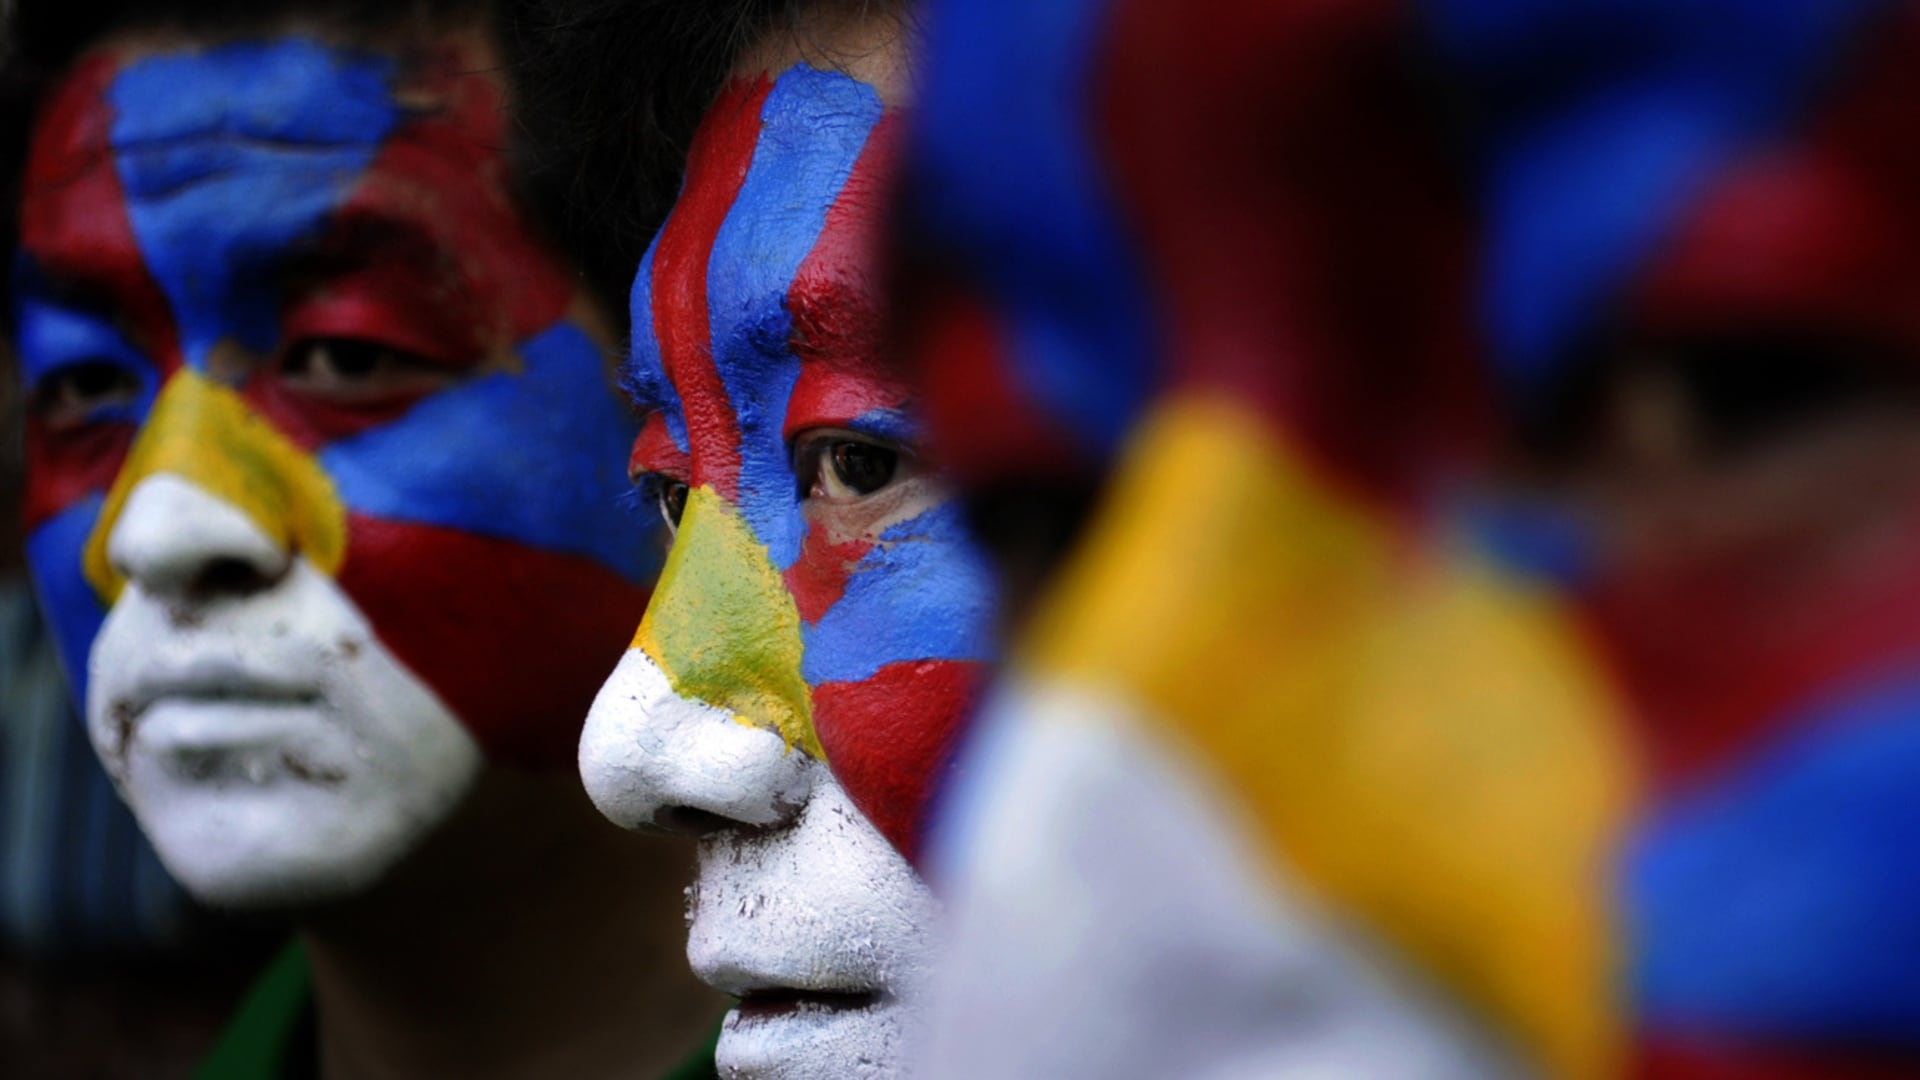 Swiss democracy tool for Tibet